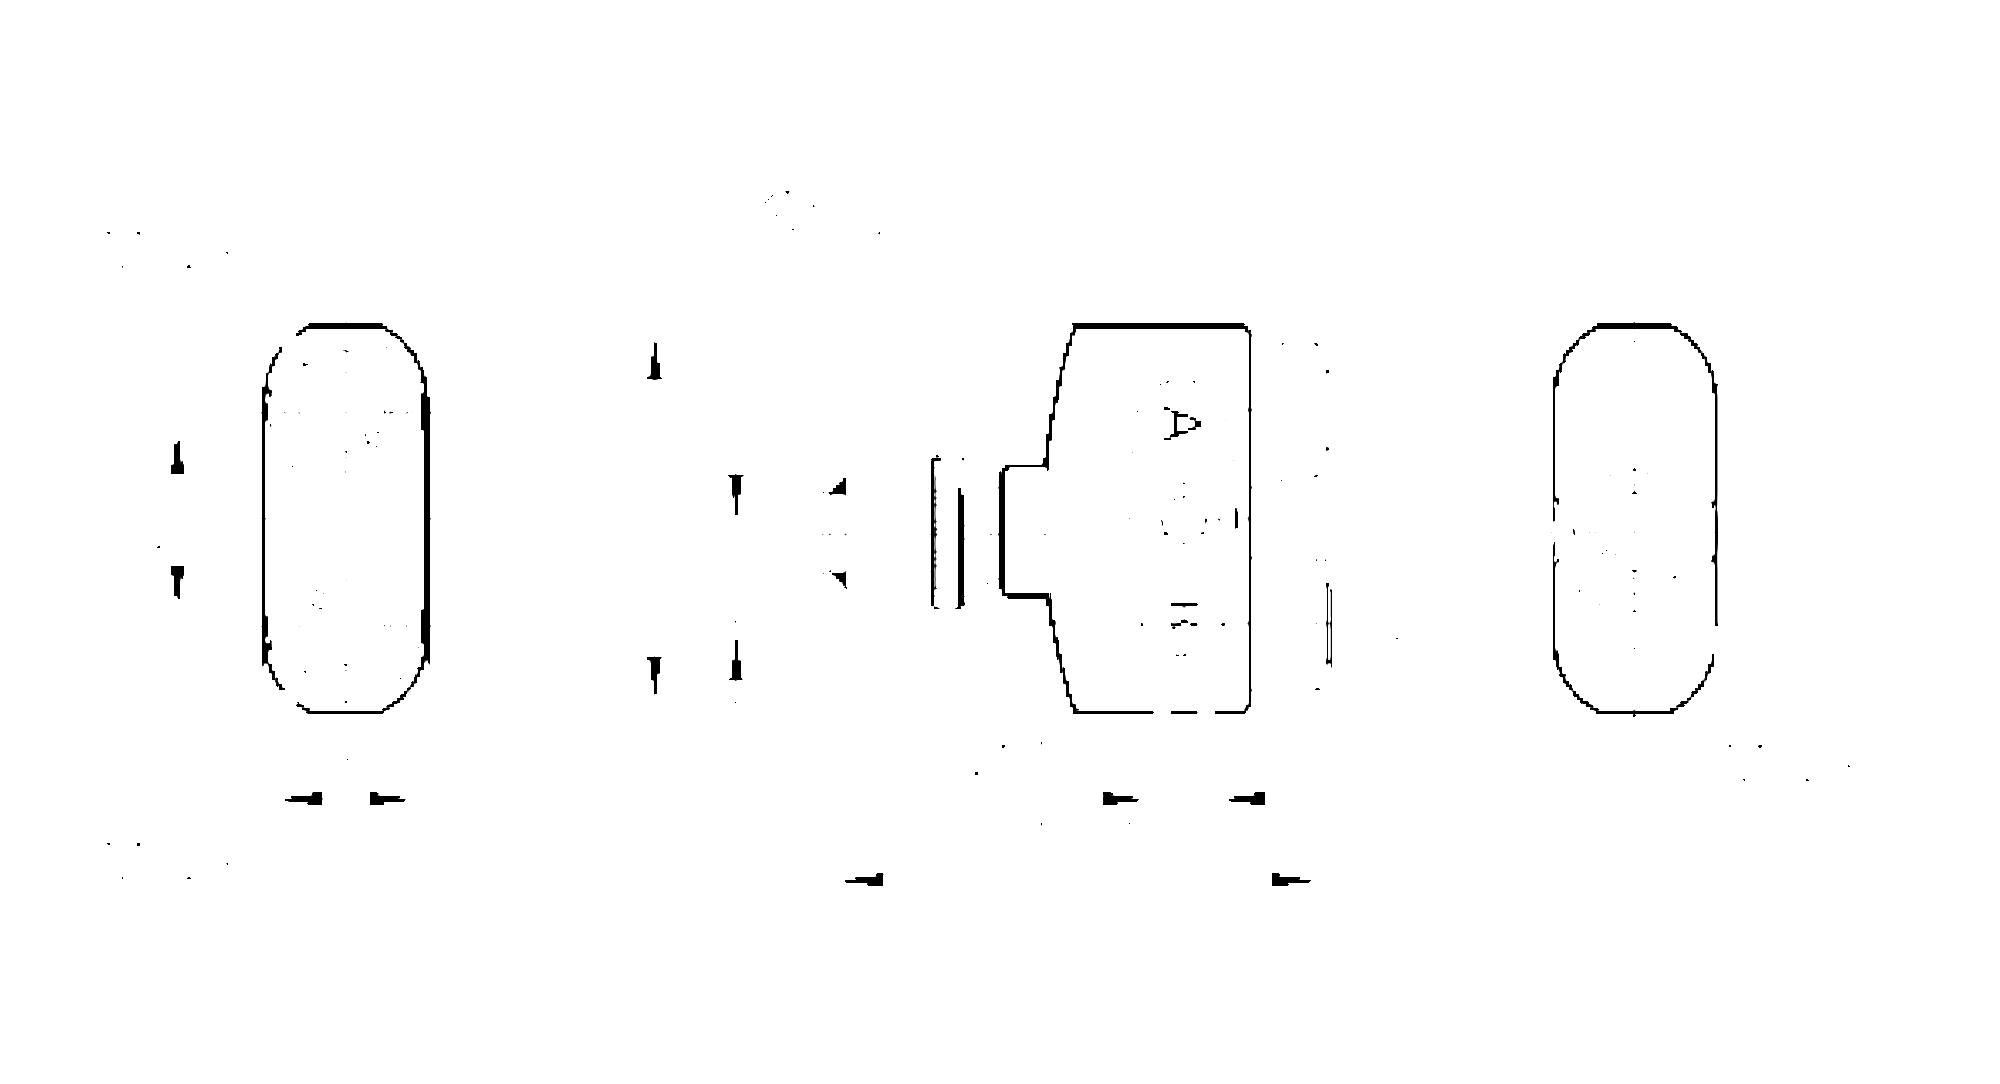 ebc113 - y-splitter